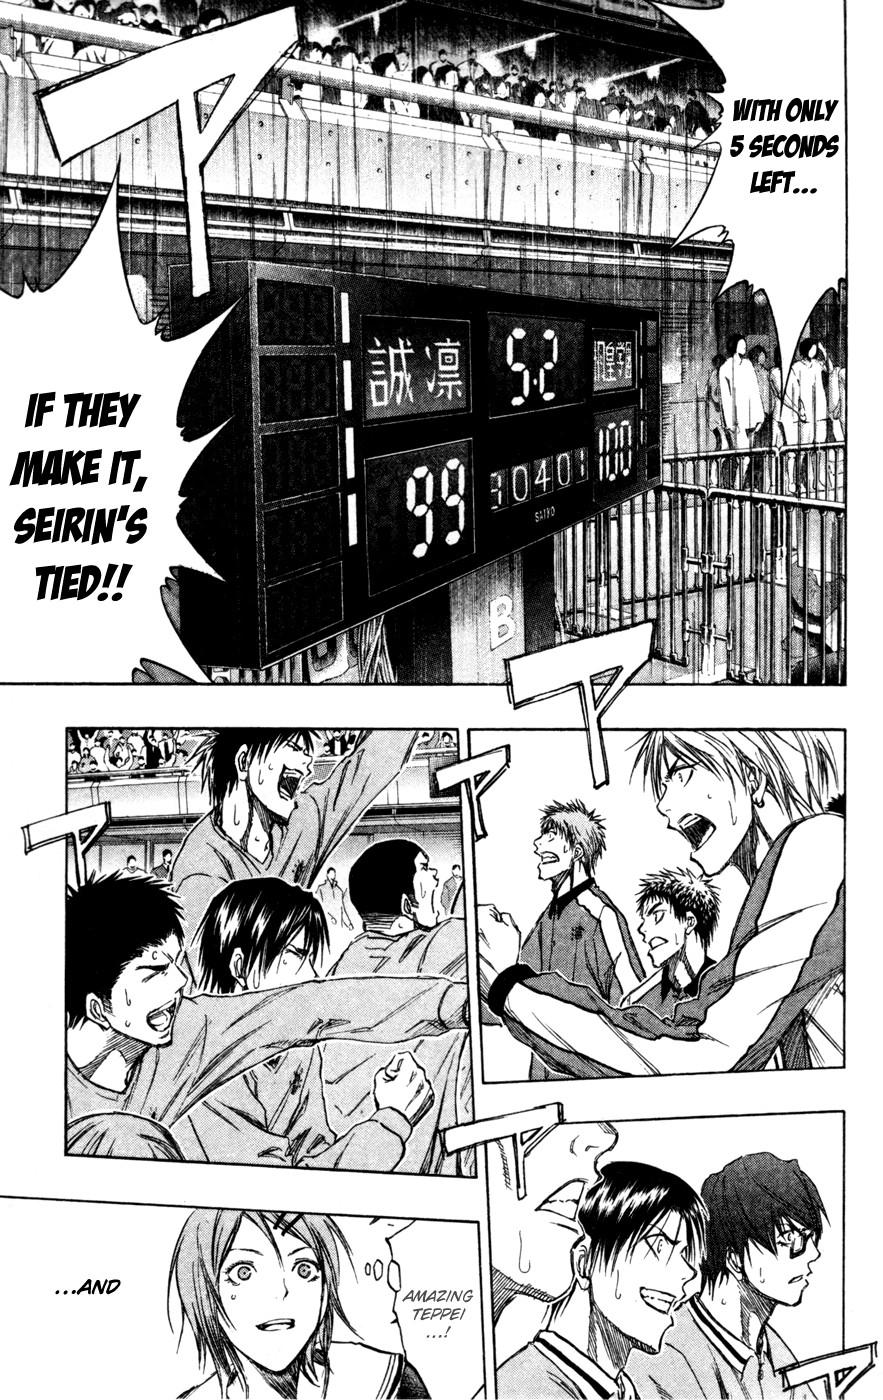 Kuroko no Basket Manga Chapter 138 - Image 05